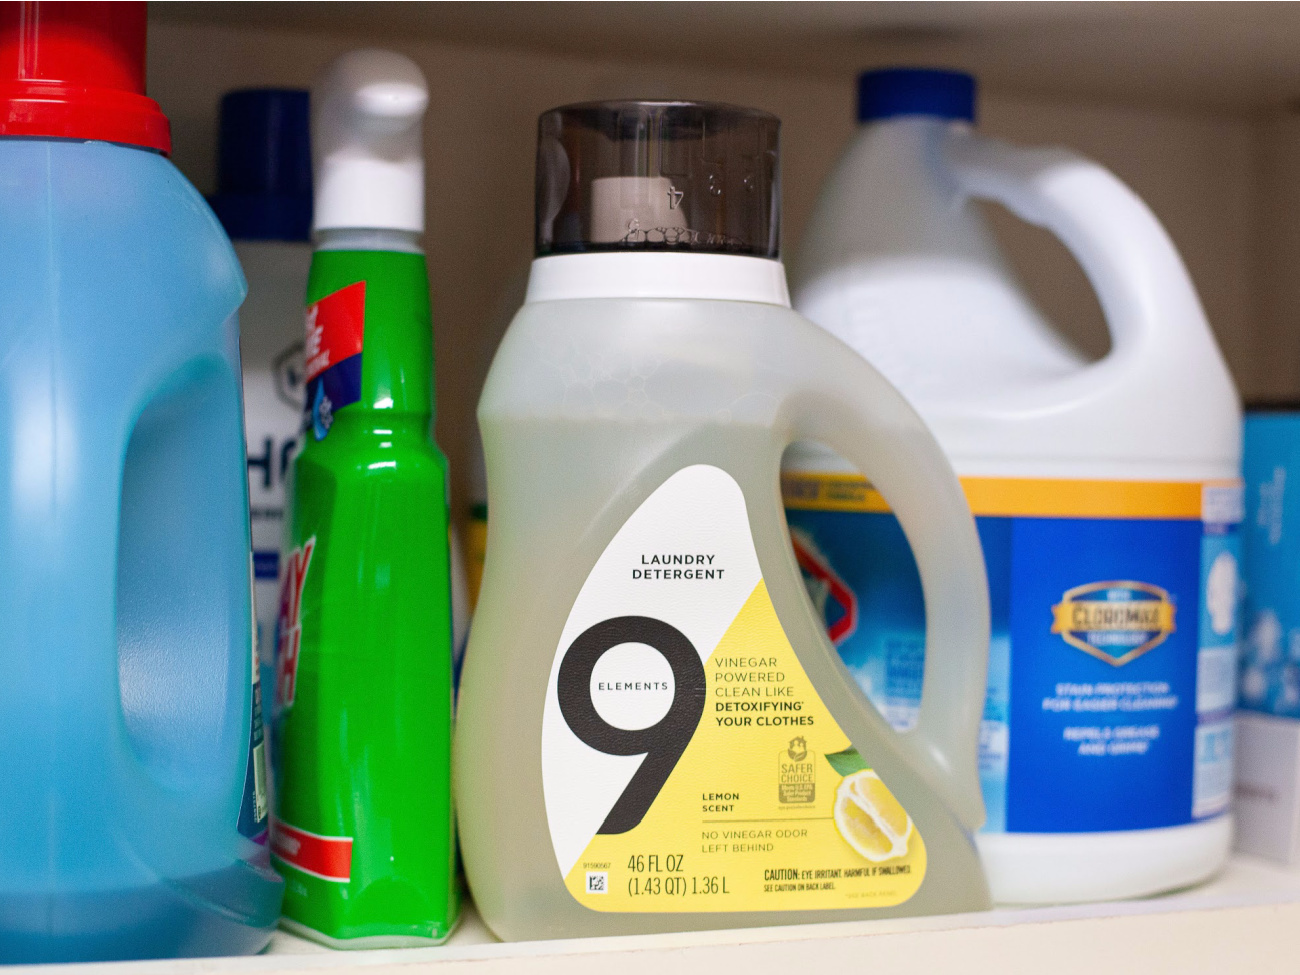 9 Elements Laundry Detergent Just $5.99 on I Heart Publix